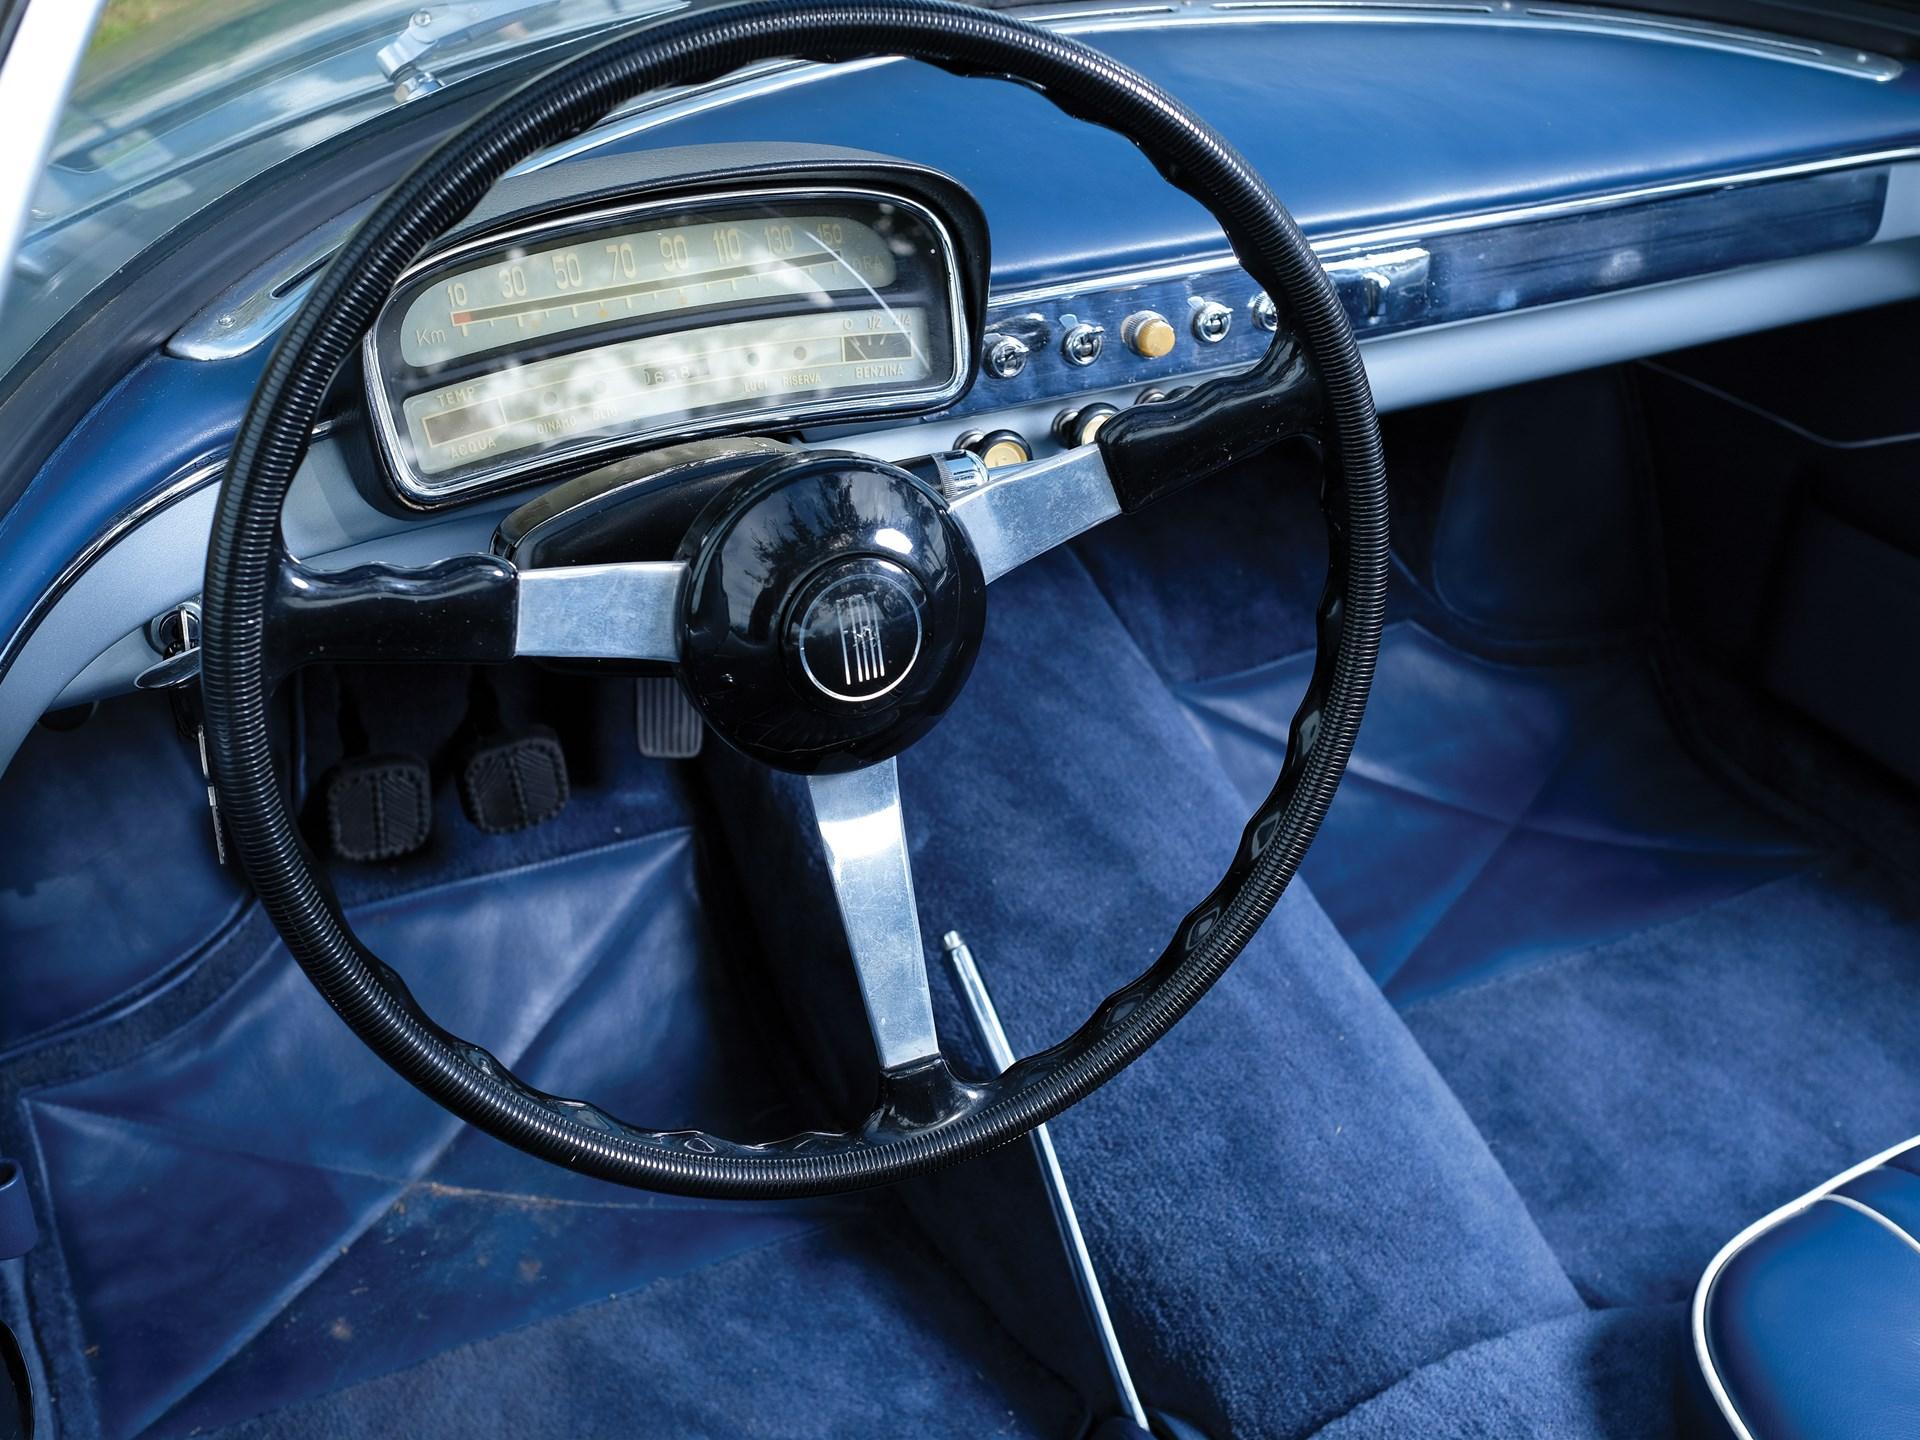 1957 Fiat-Stanguellini 1200 Spider America by Bertone